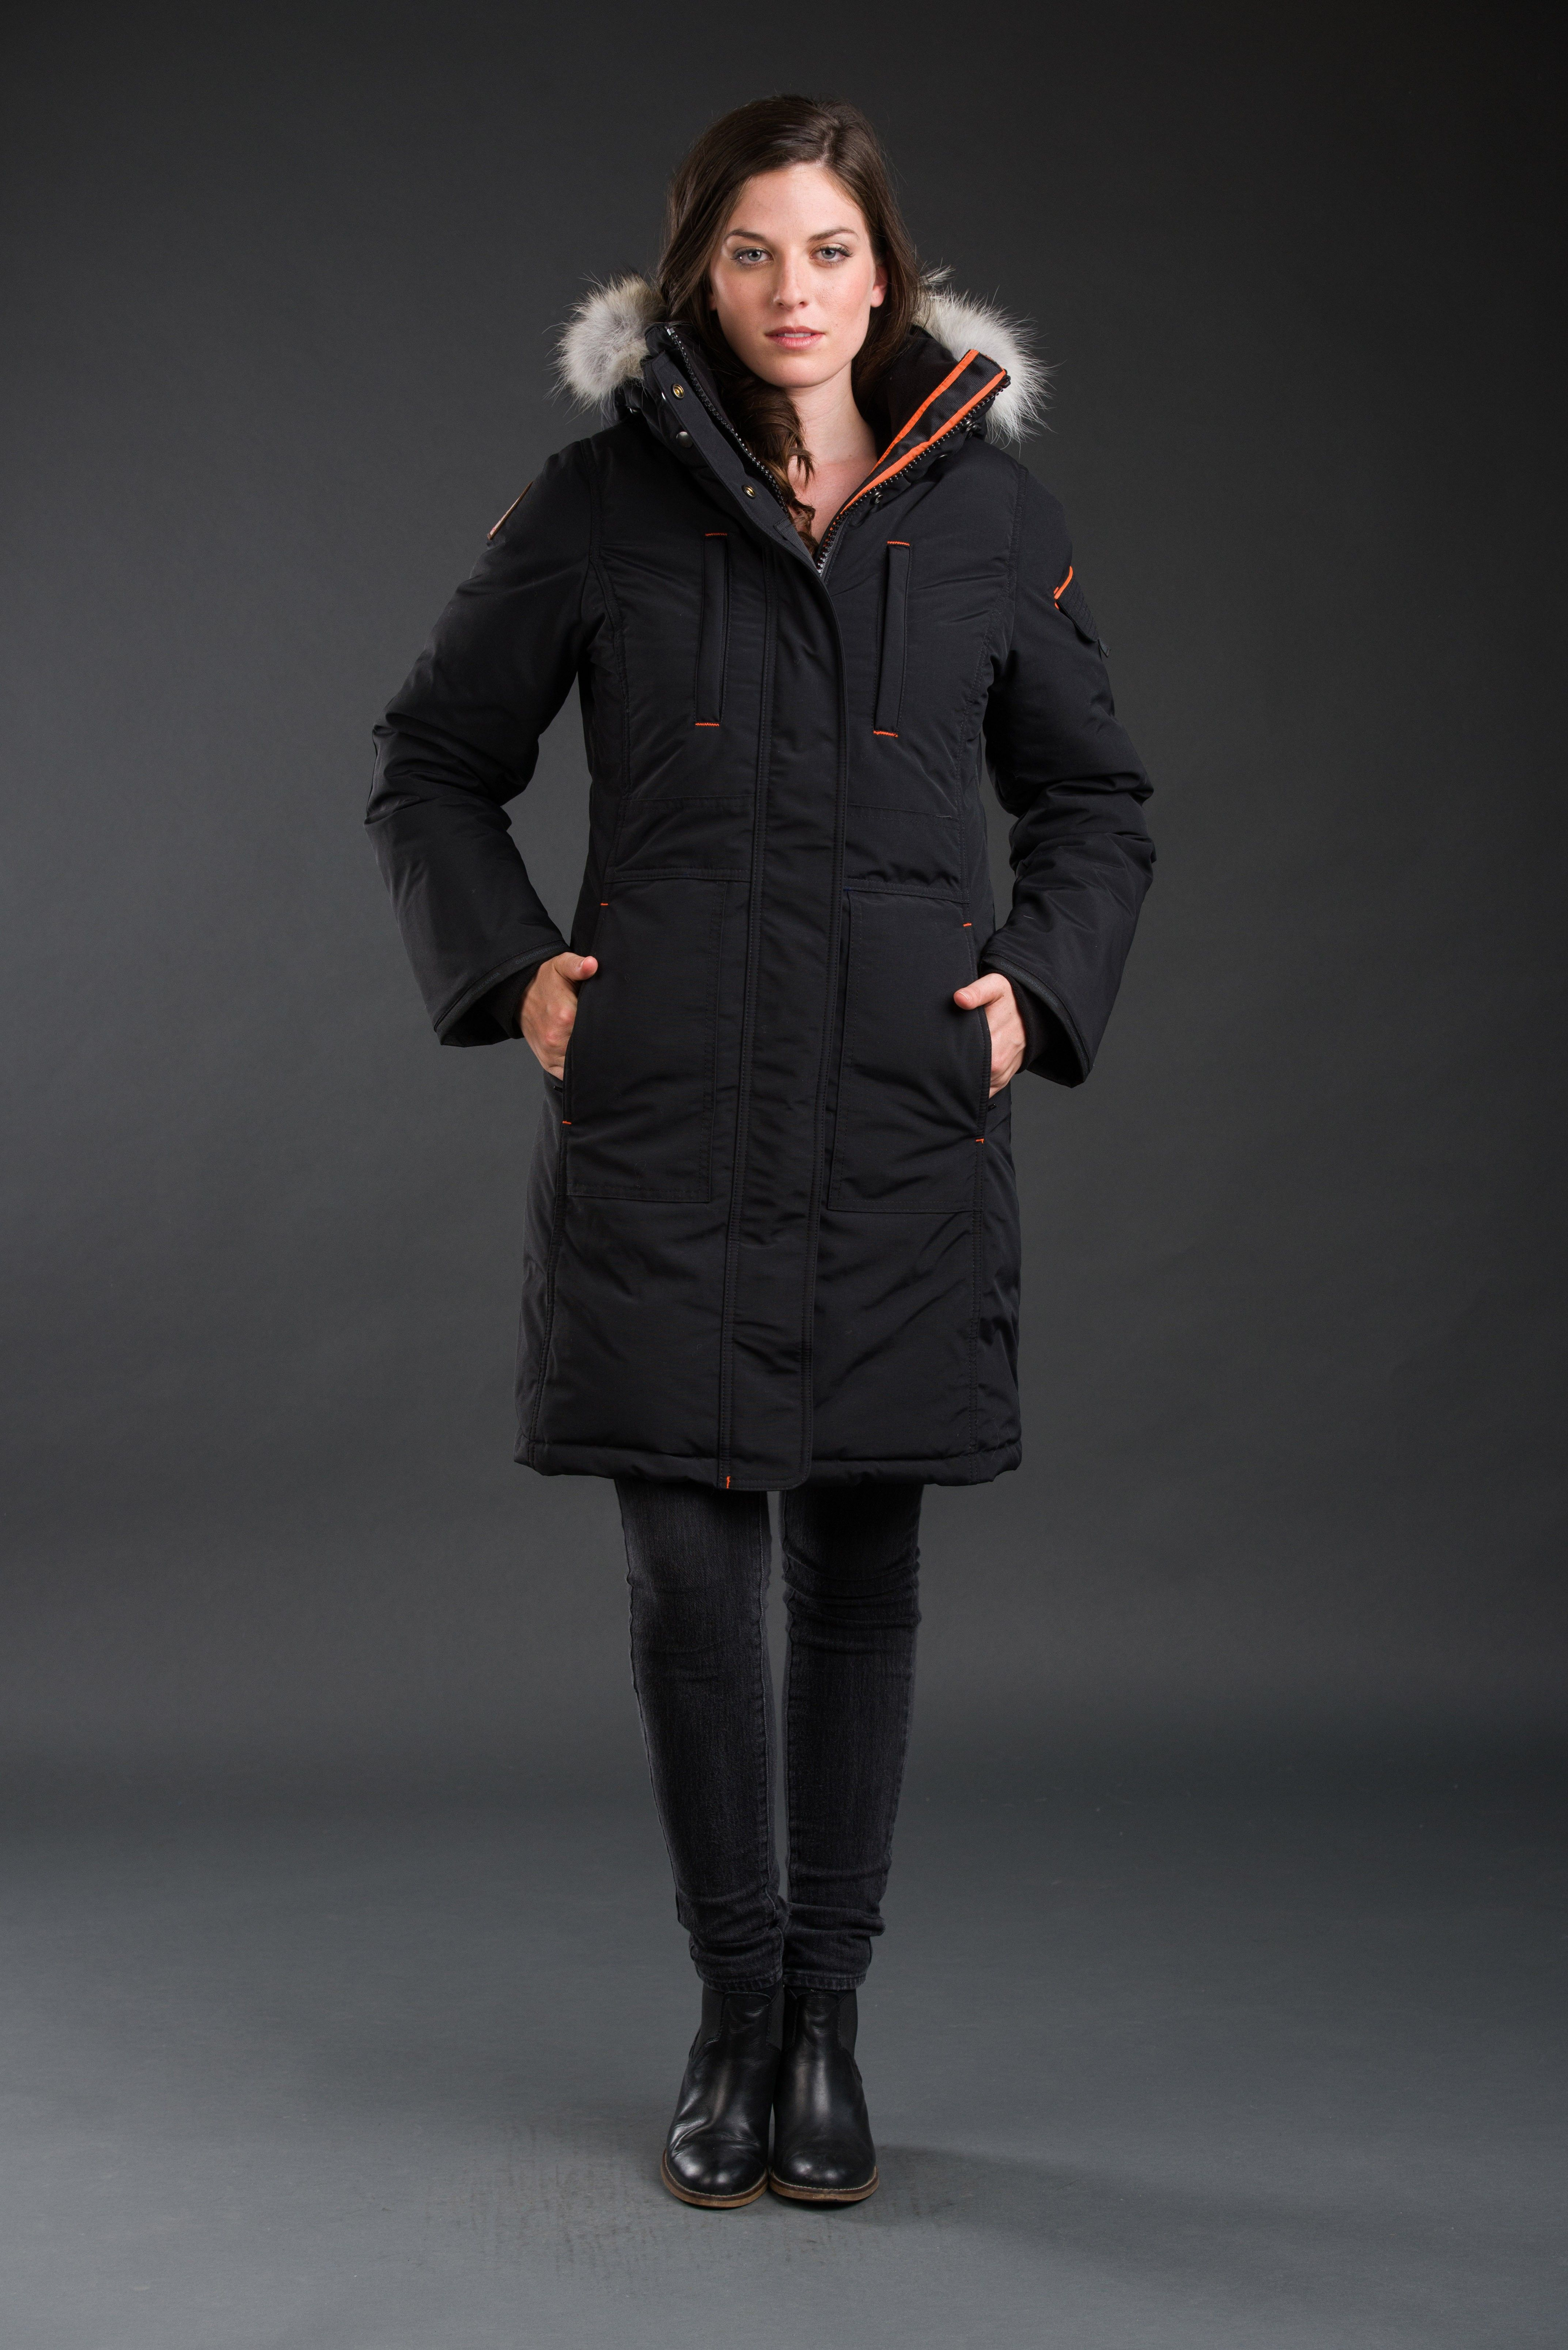 OSC LADIES NISTO PARKA - OS1081S-ORCA BLACK | Coats and jackets ...